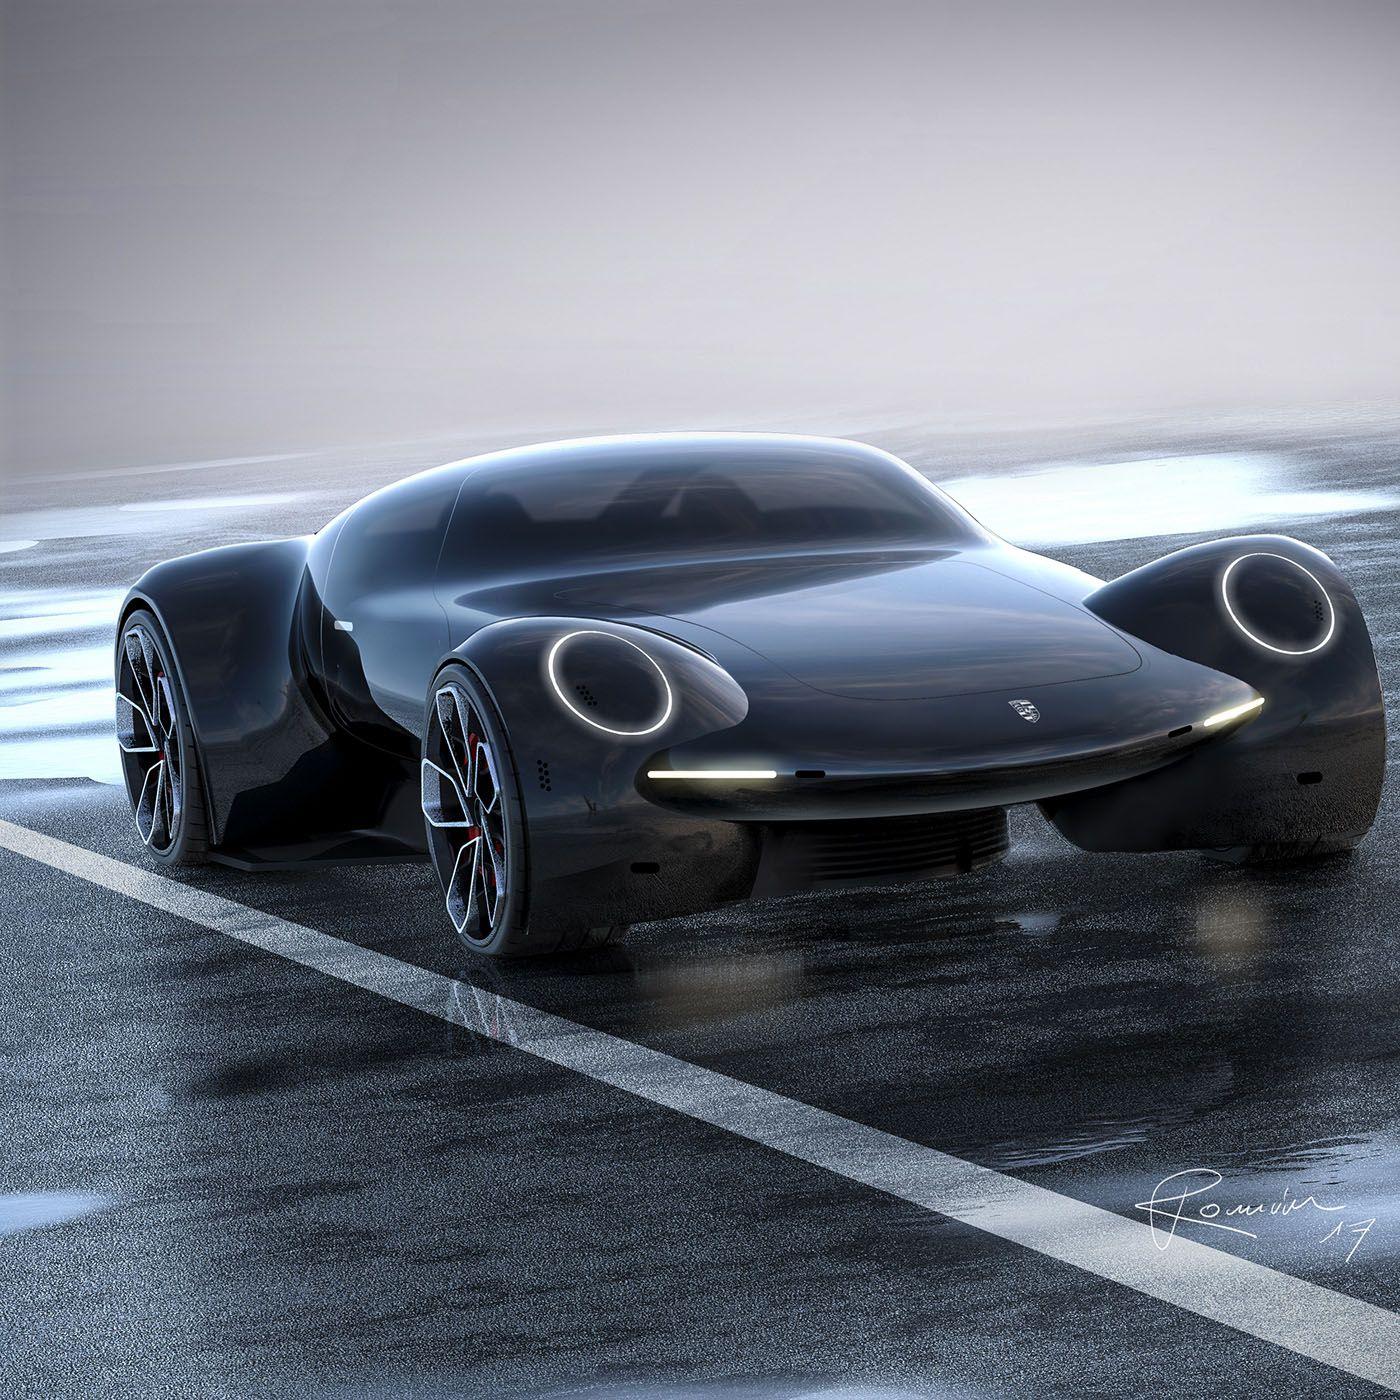 Porsche 9e1 Study Envisions An All Electric Future Hypercar Carscoops Super Cars Futuristic Cars Concept Car Design